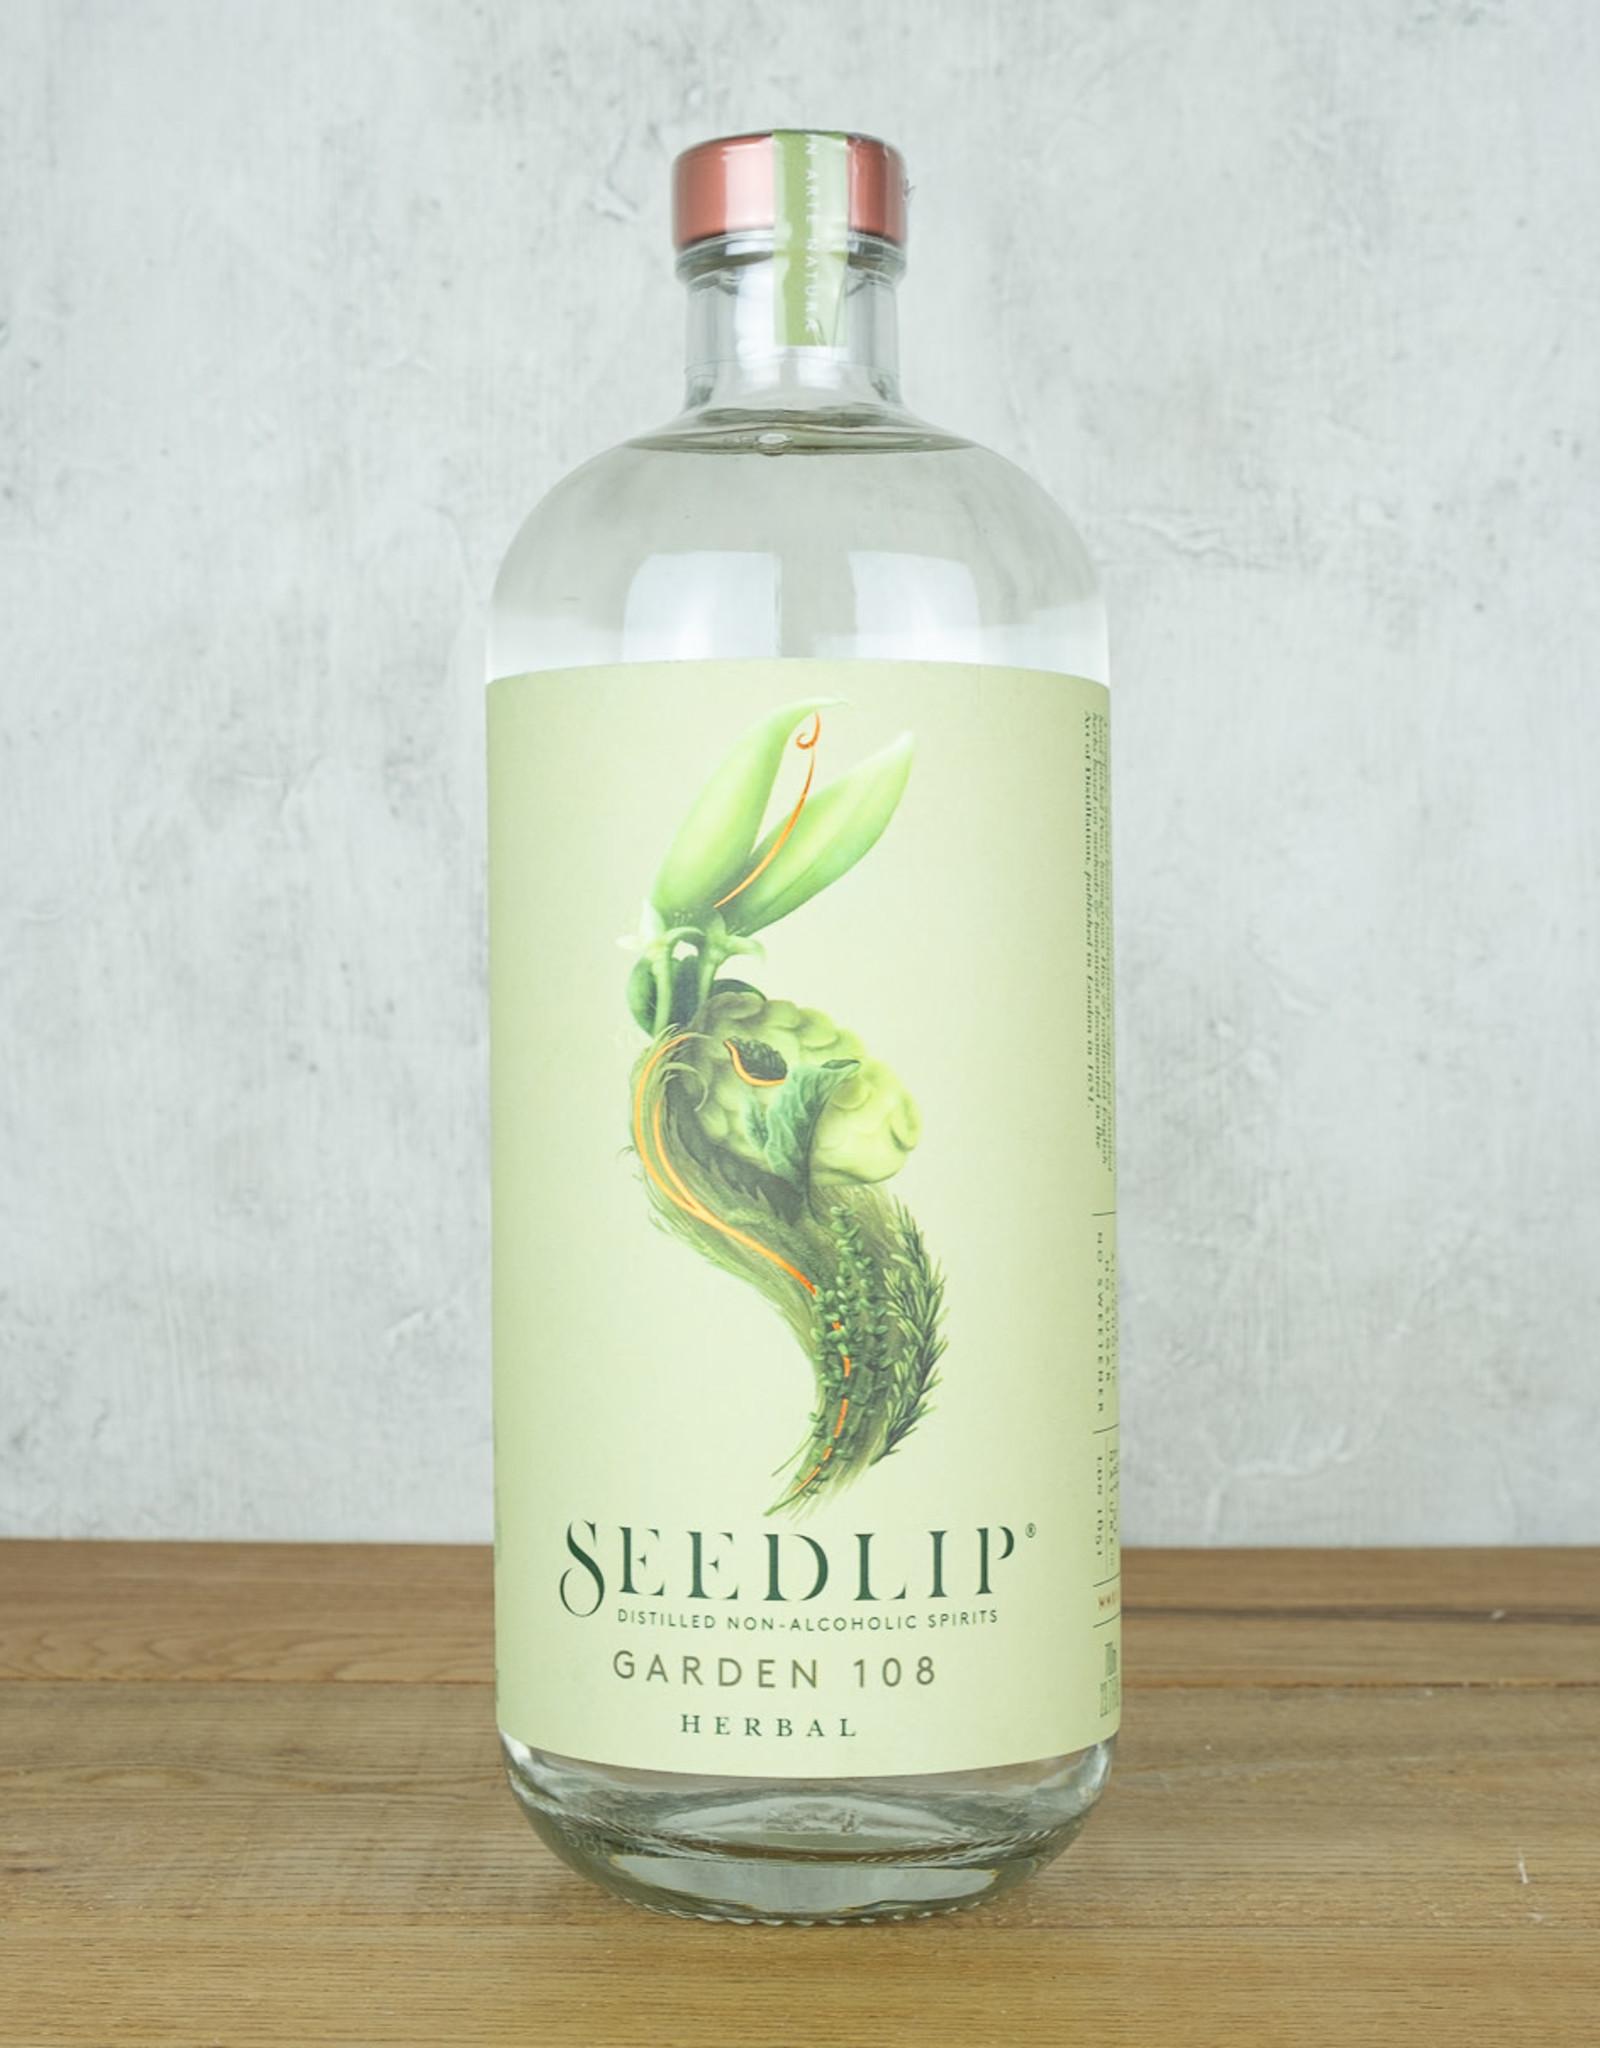 Seedlip Garden